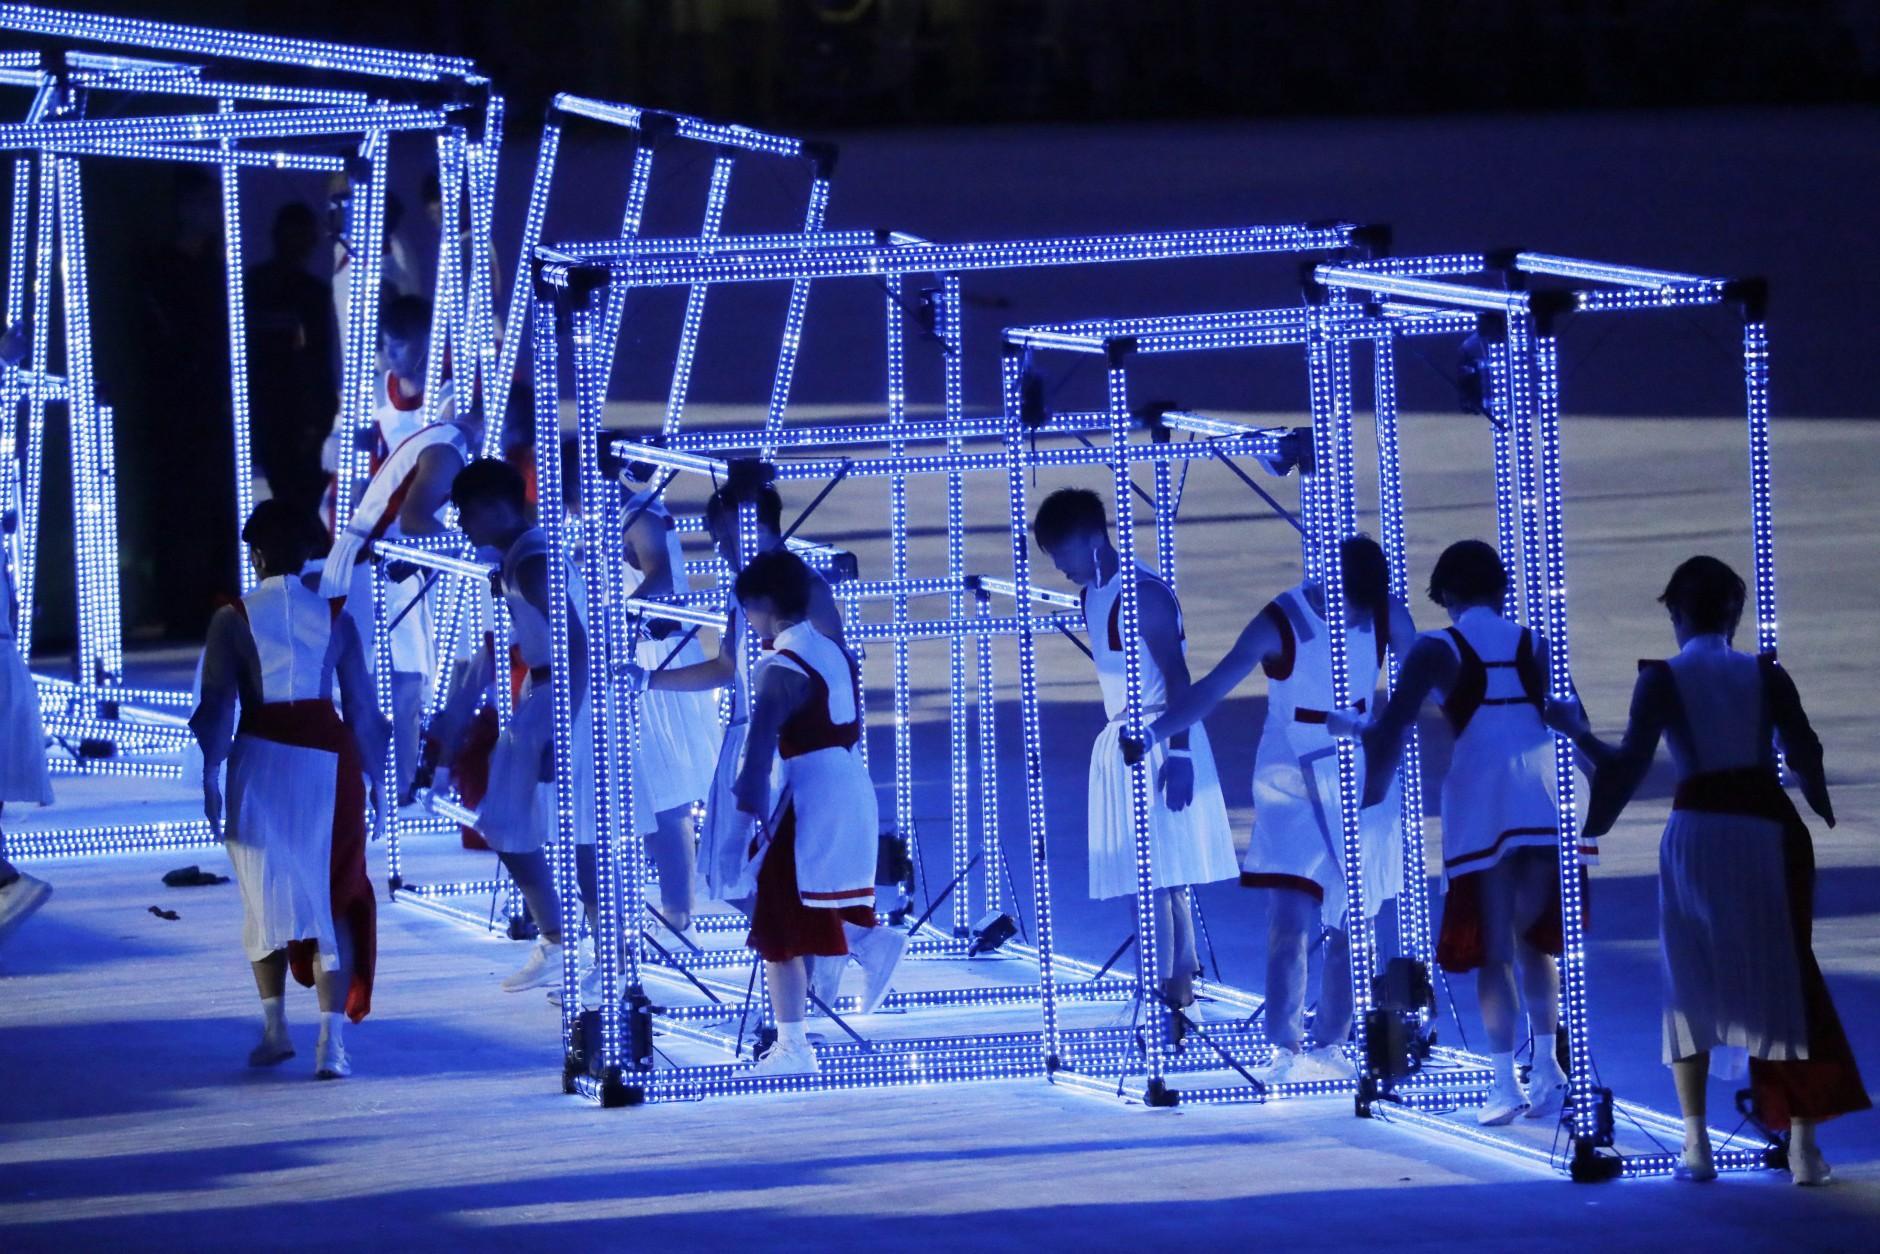 Performers maneuver near light cubes during the closing ceremony in the Maracana stadium at the 2016 Summer Olympics in Rio de Janeiro, Brazil, Sunday, Aug. 21, 2016. (AP Photo/Mark Humphrey)